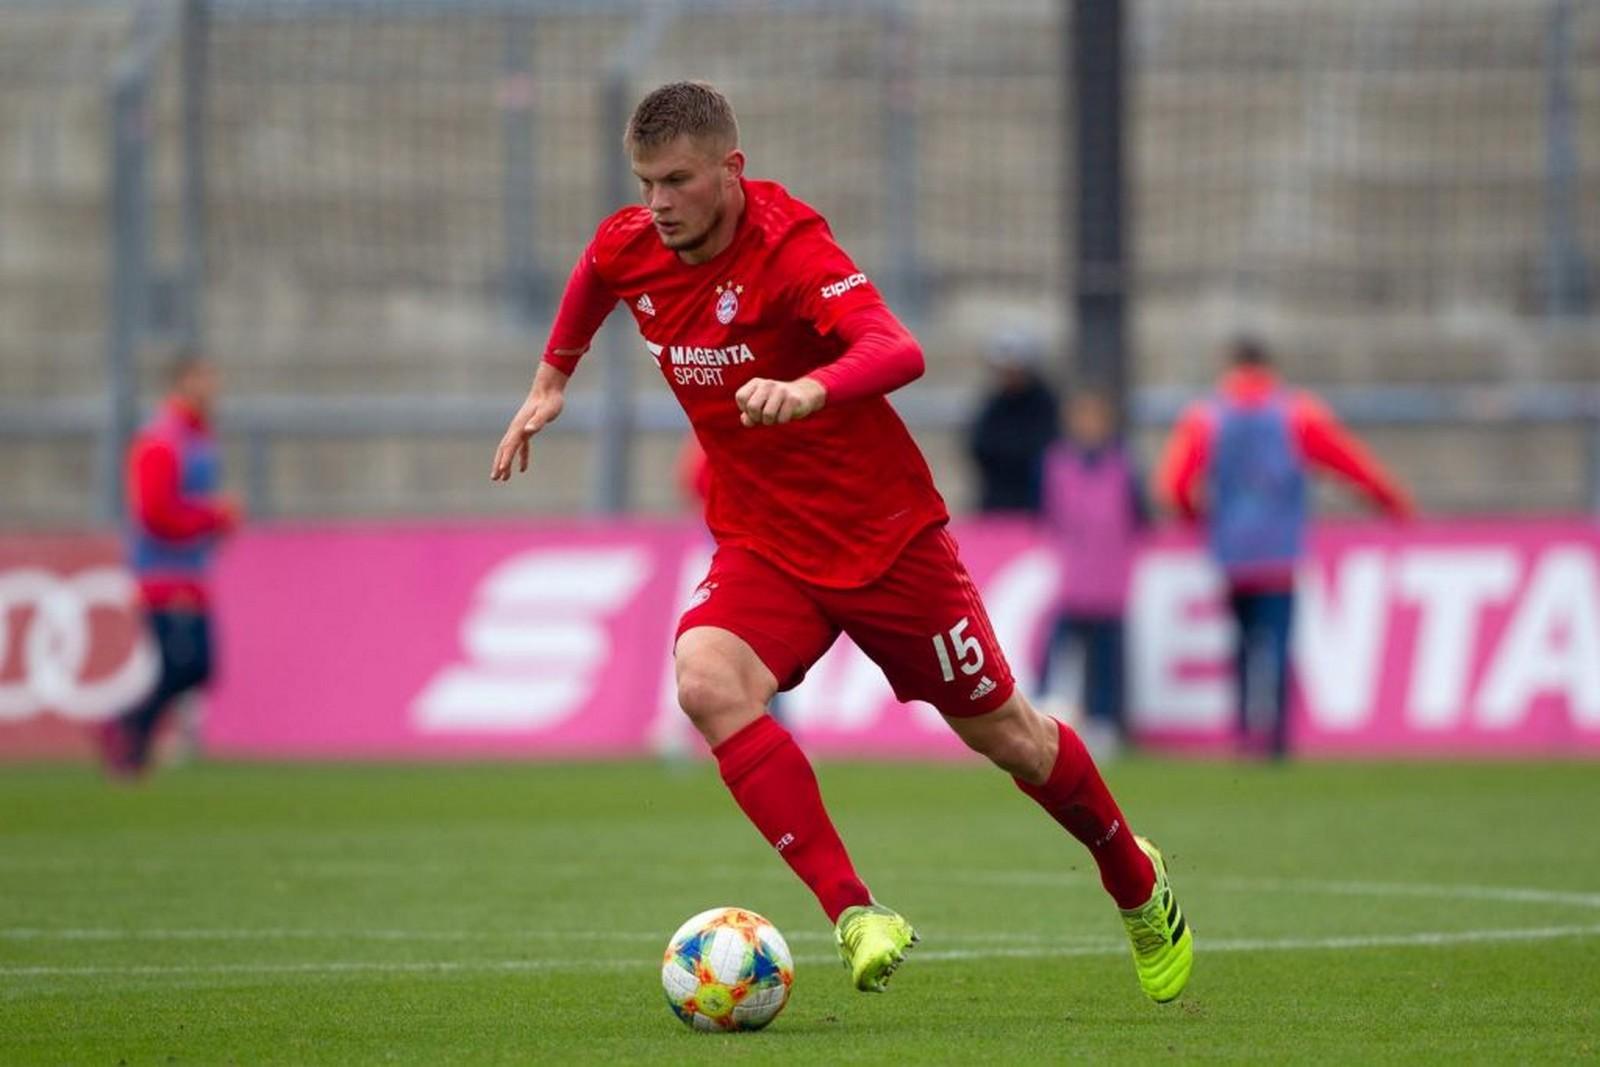 Lukas Mai vom FC Bayern